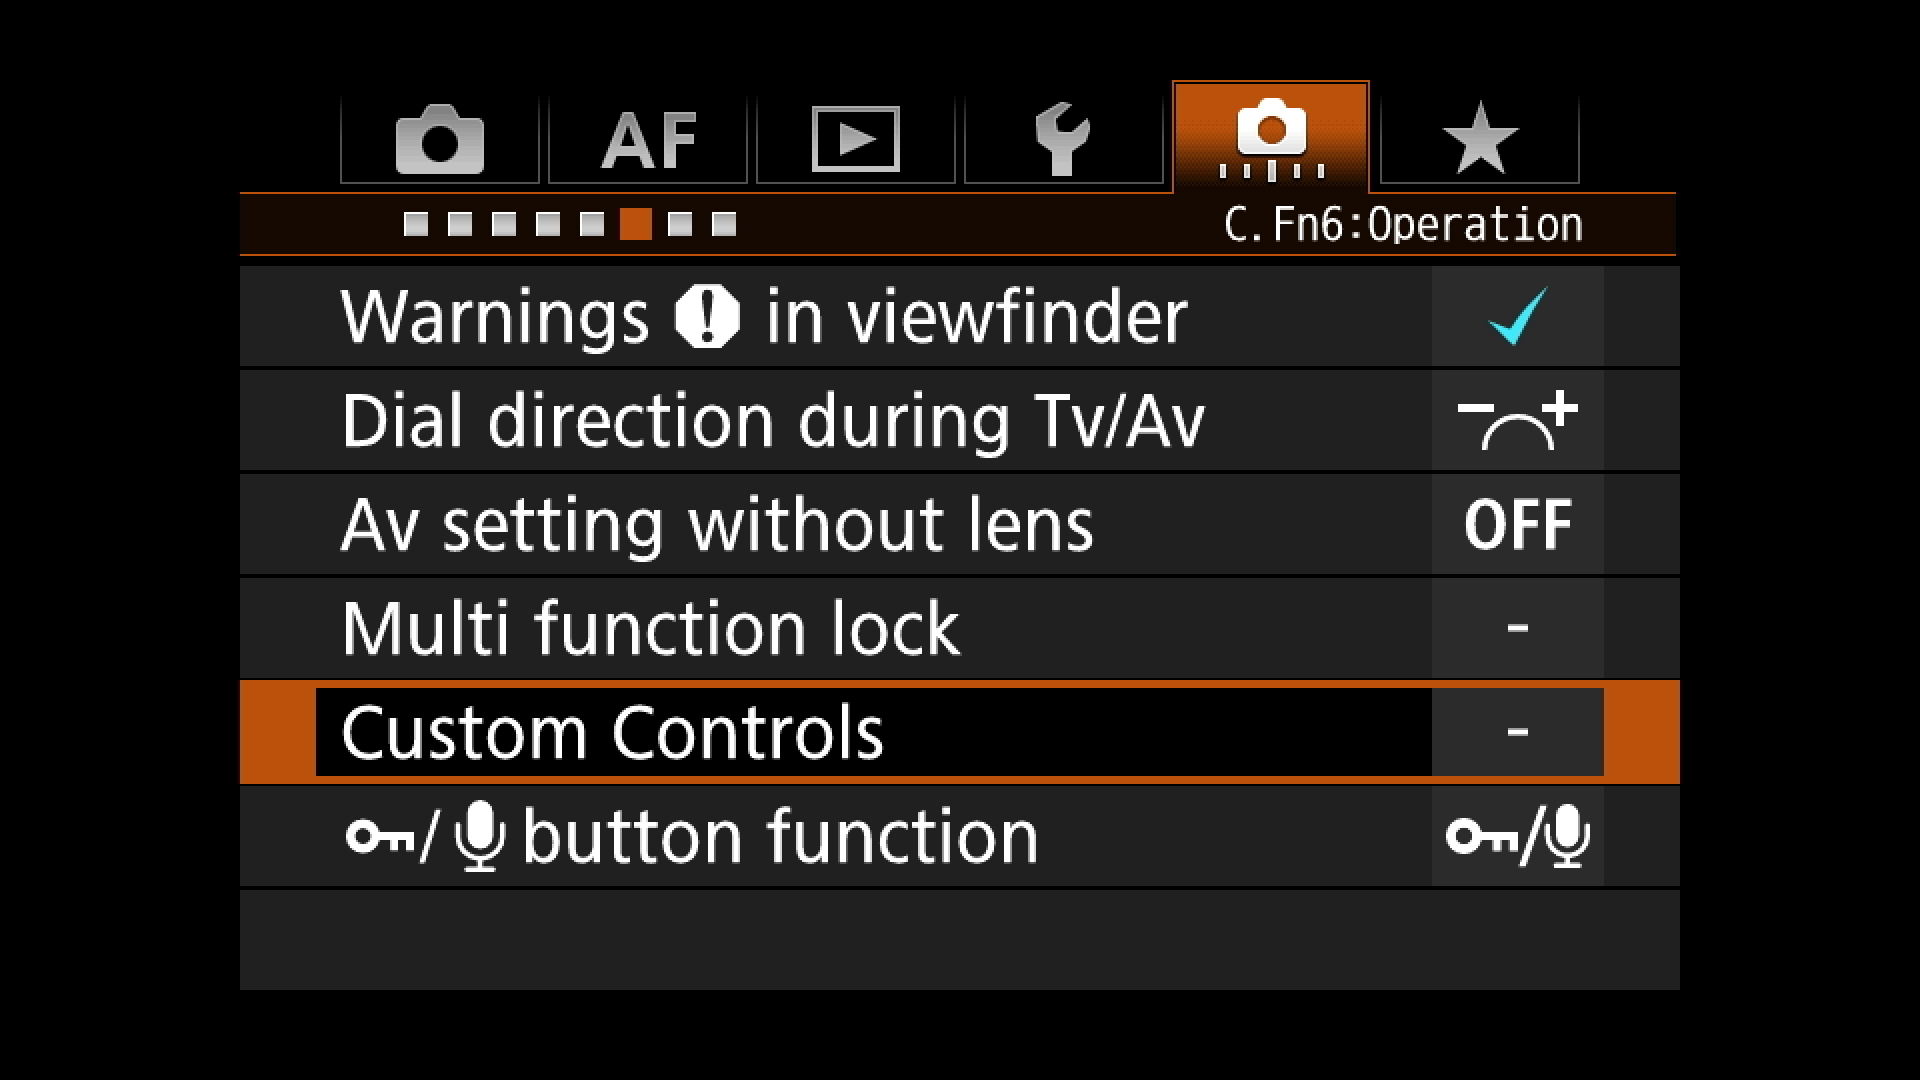 Step One - locate custom controls, button customization